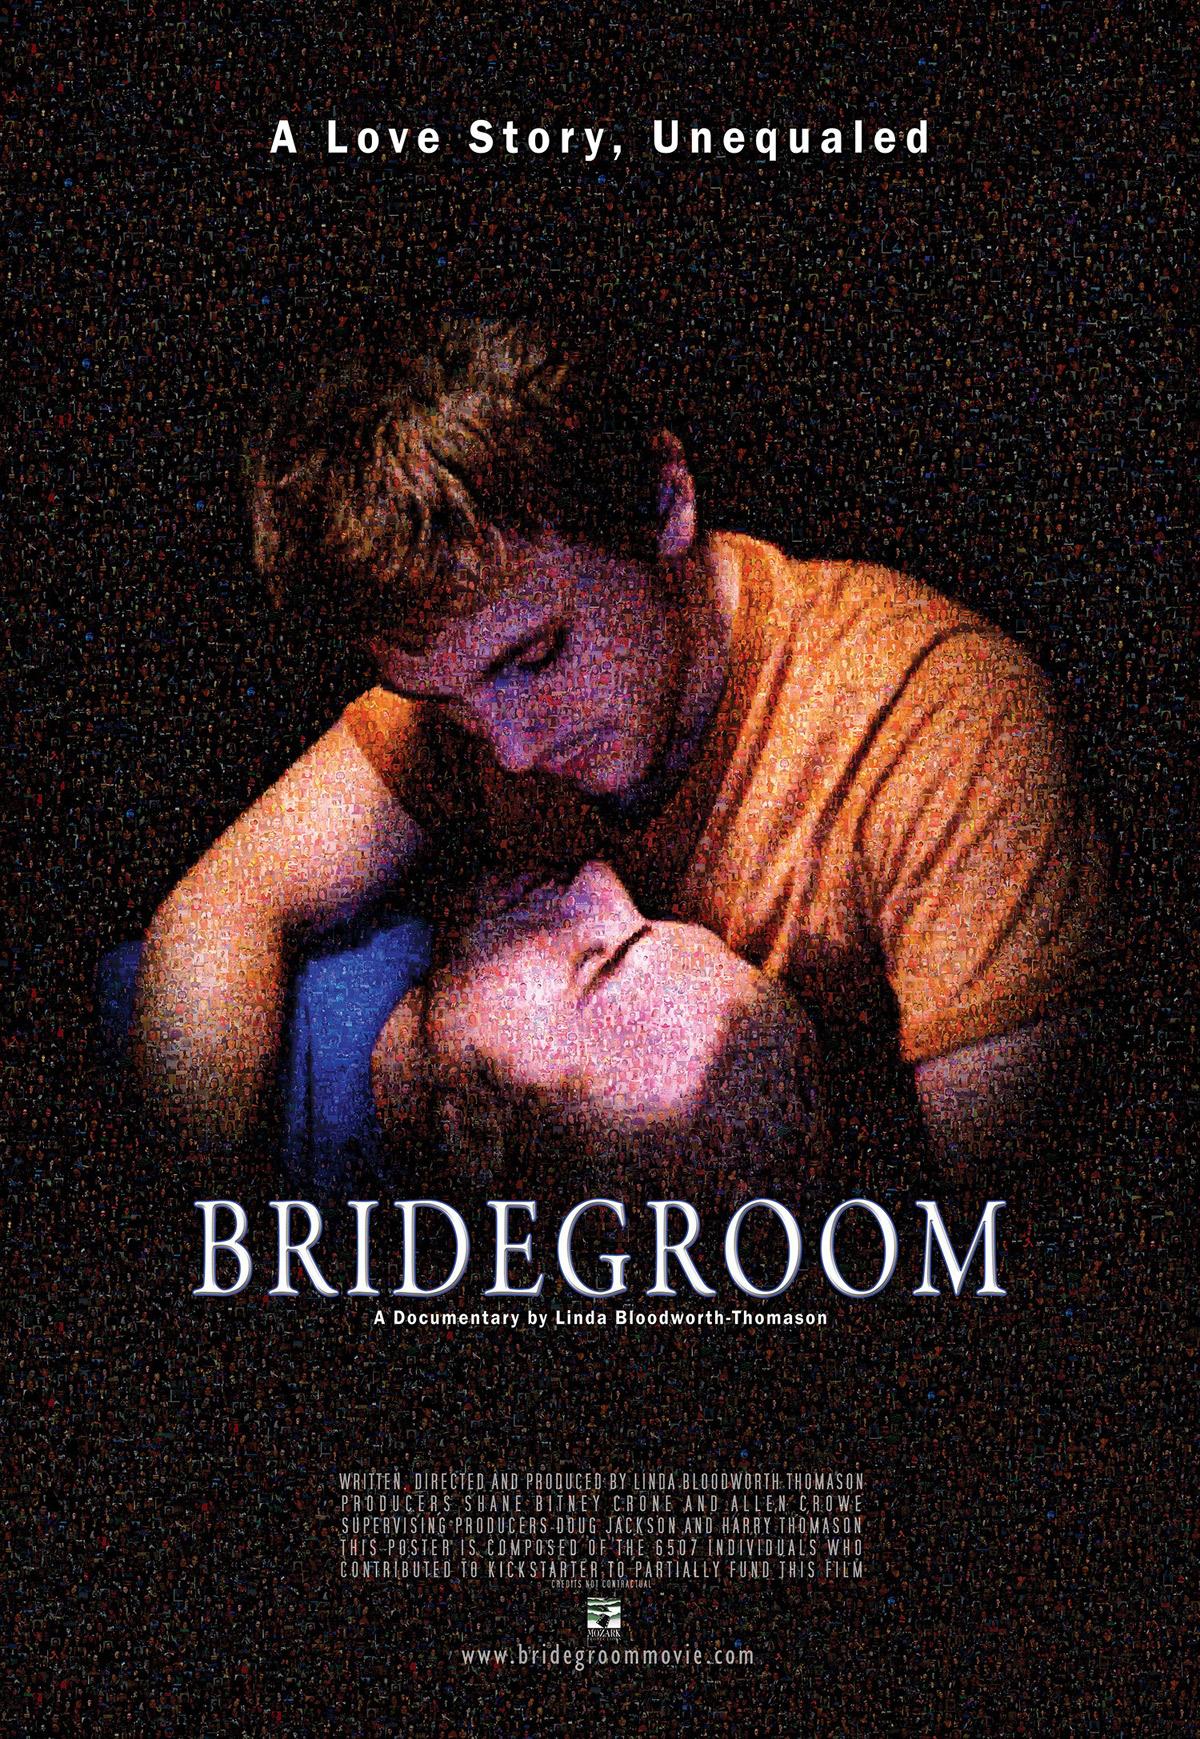 Télécharger Bridegroom DVDRIP VF